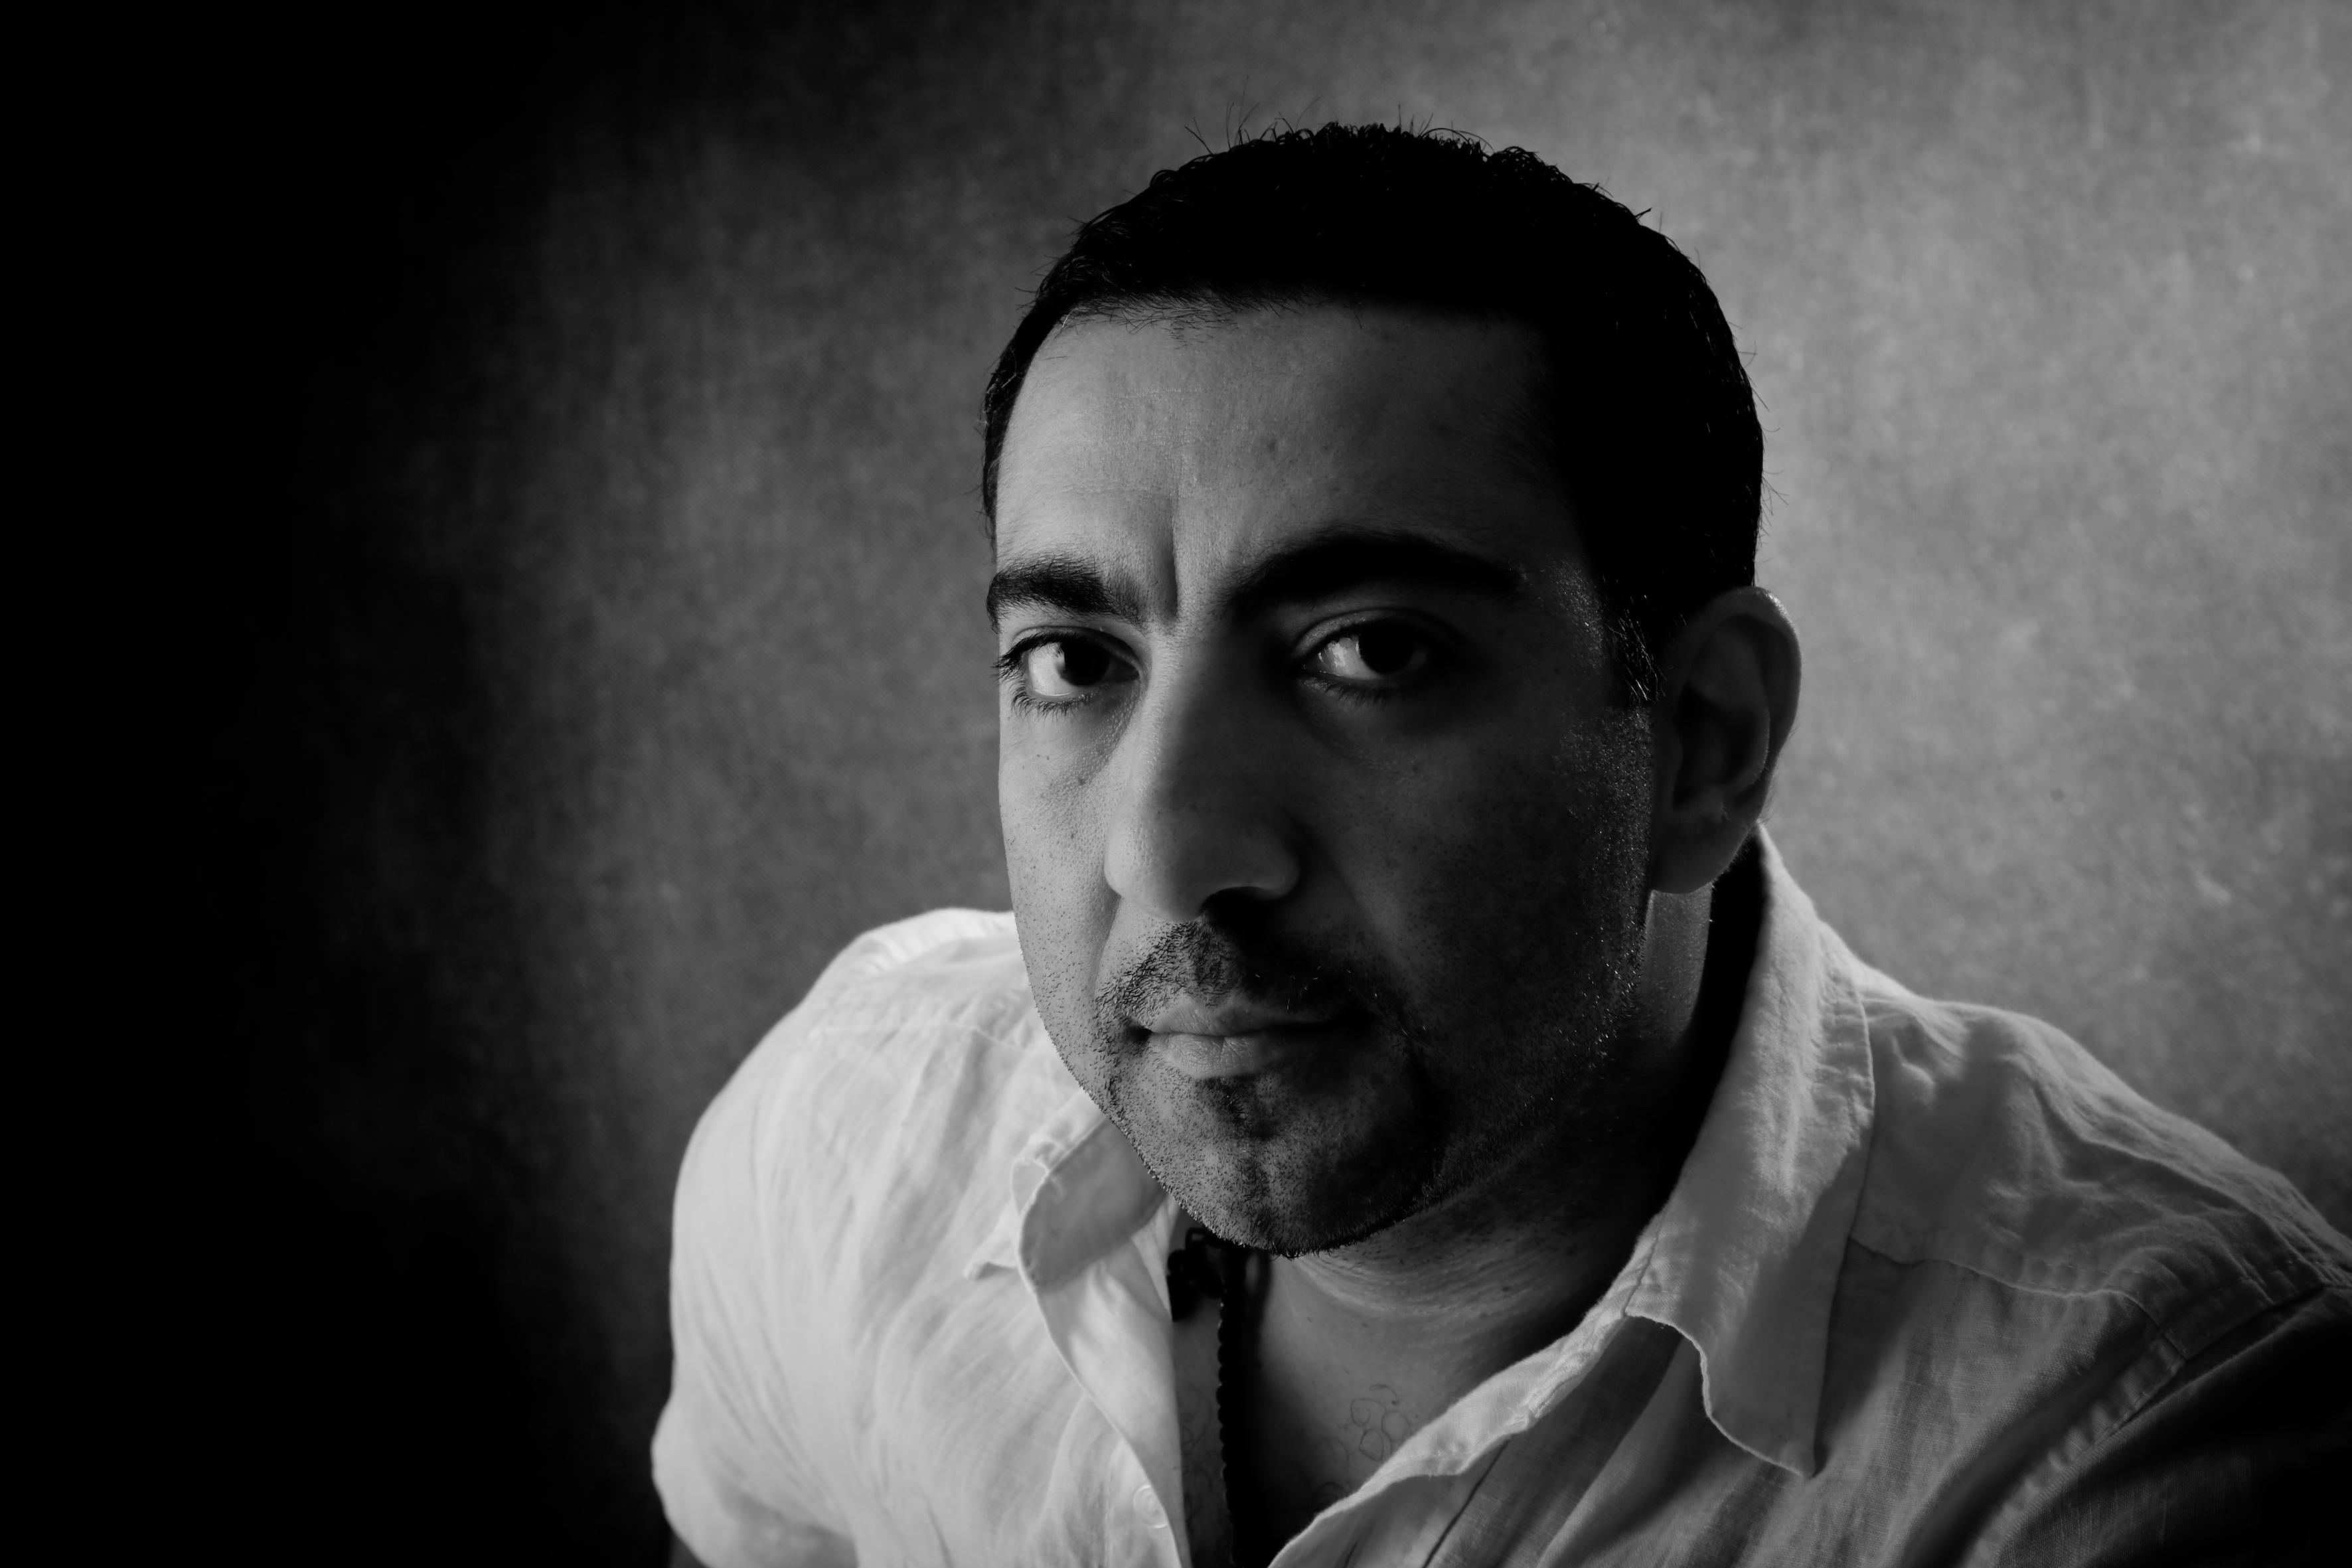 Image of Bahman Motamedian from Wikidata